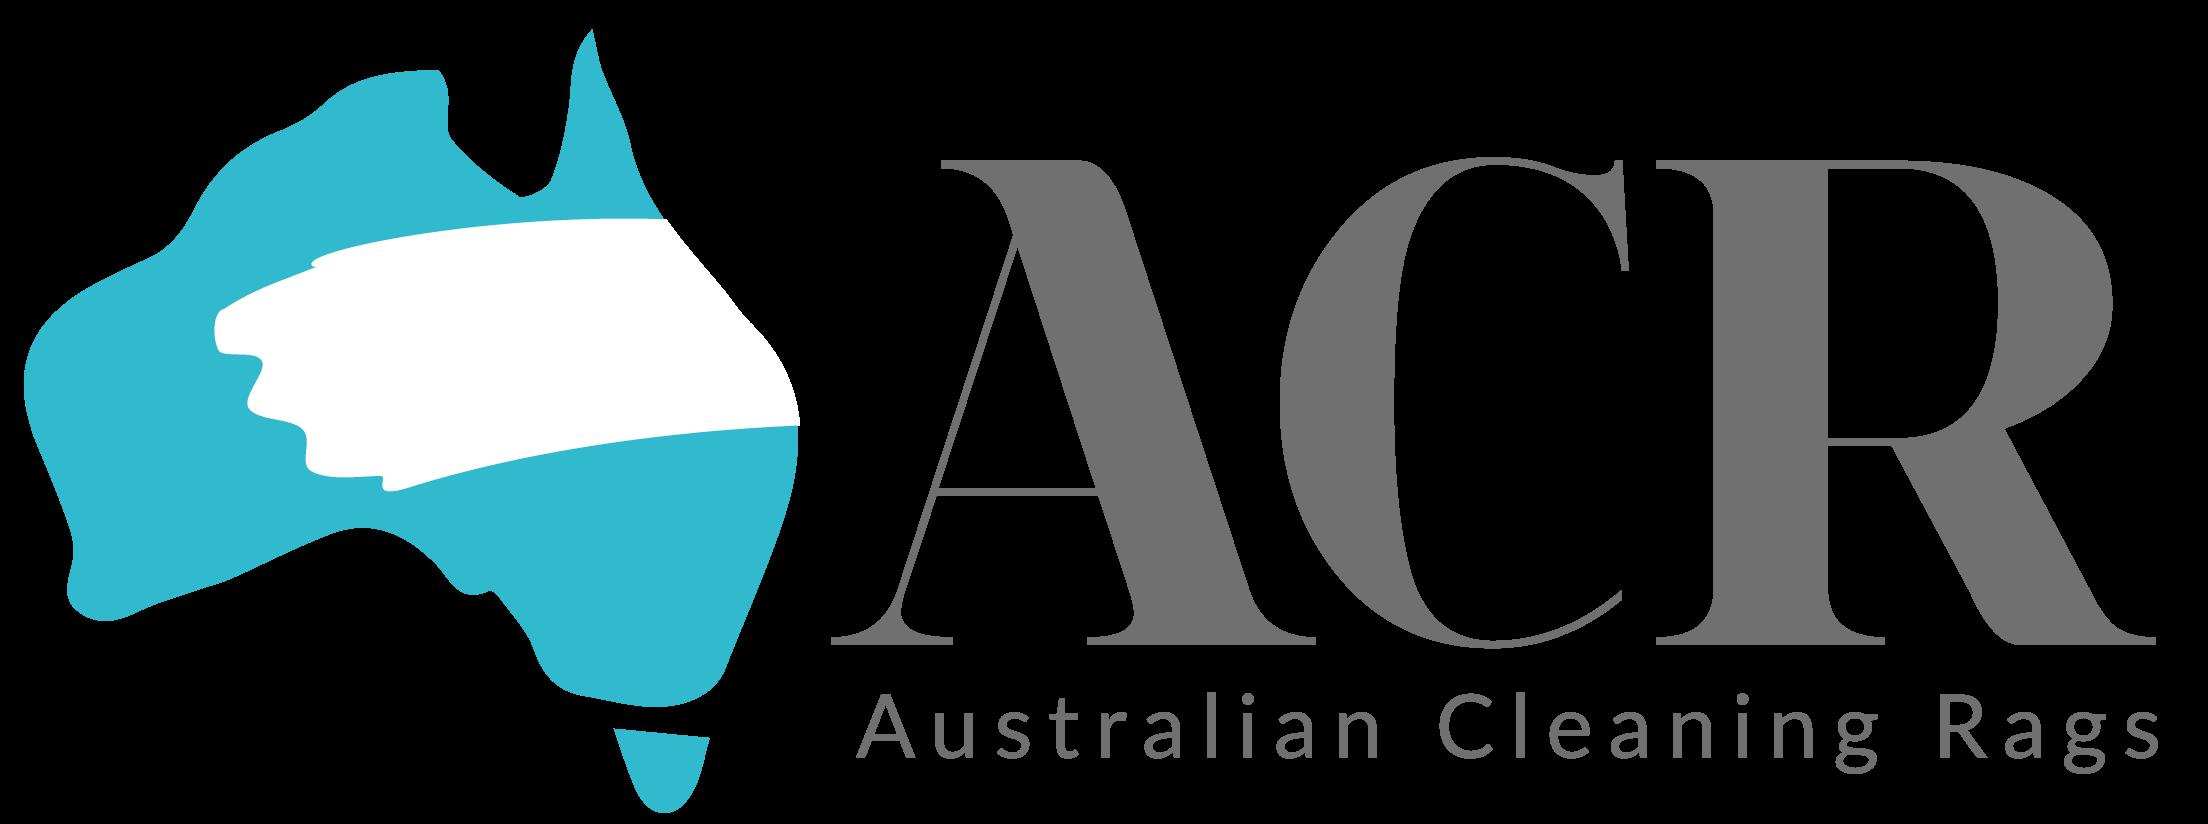 Australian Cleaning Rags Logo